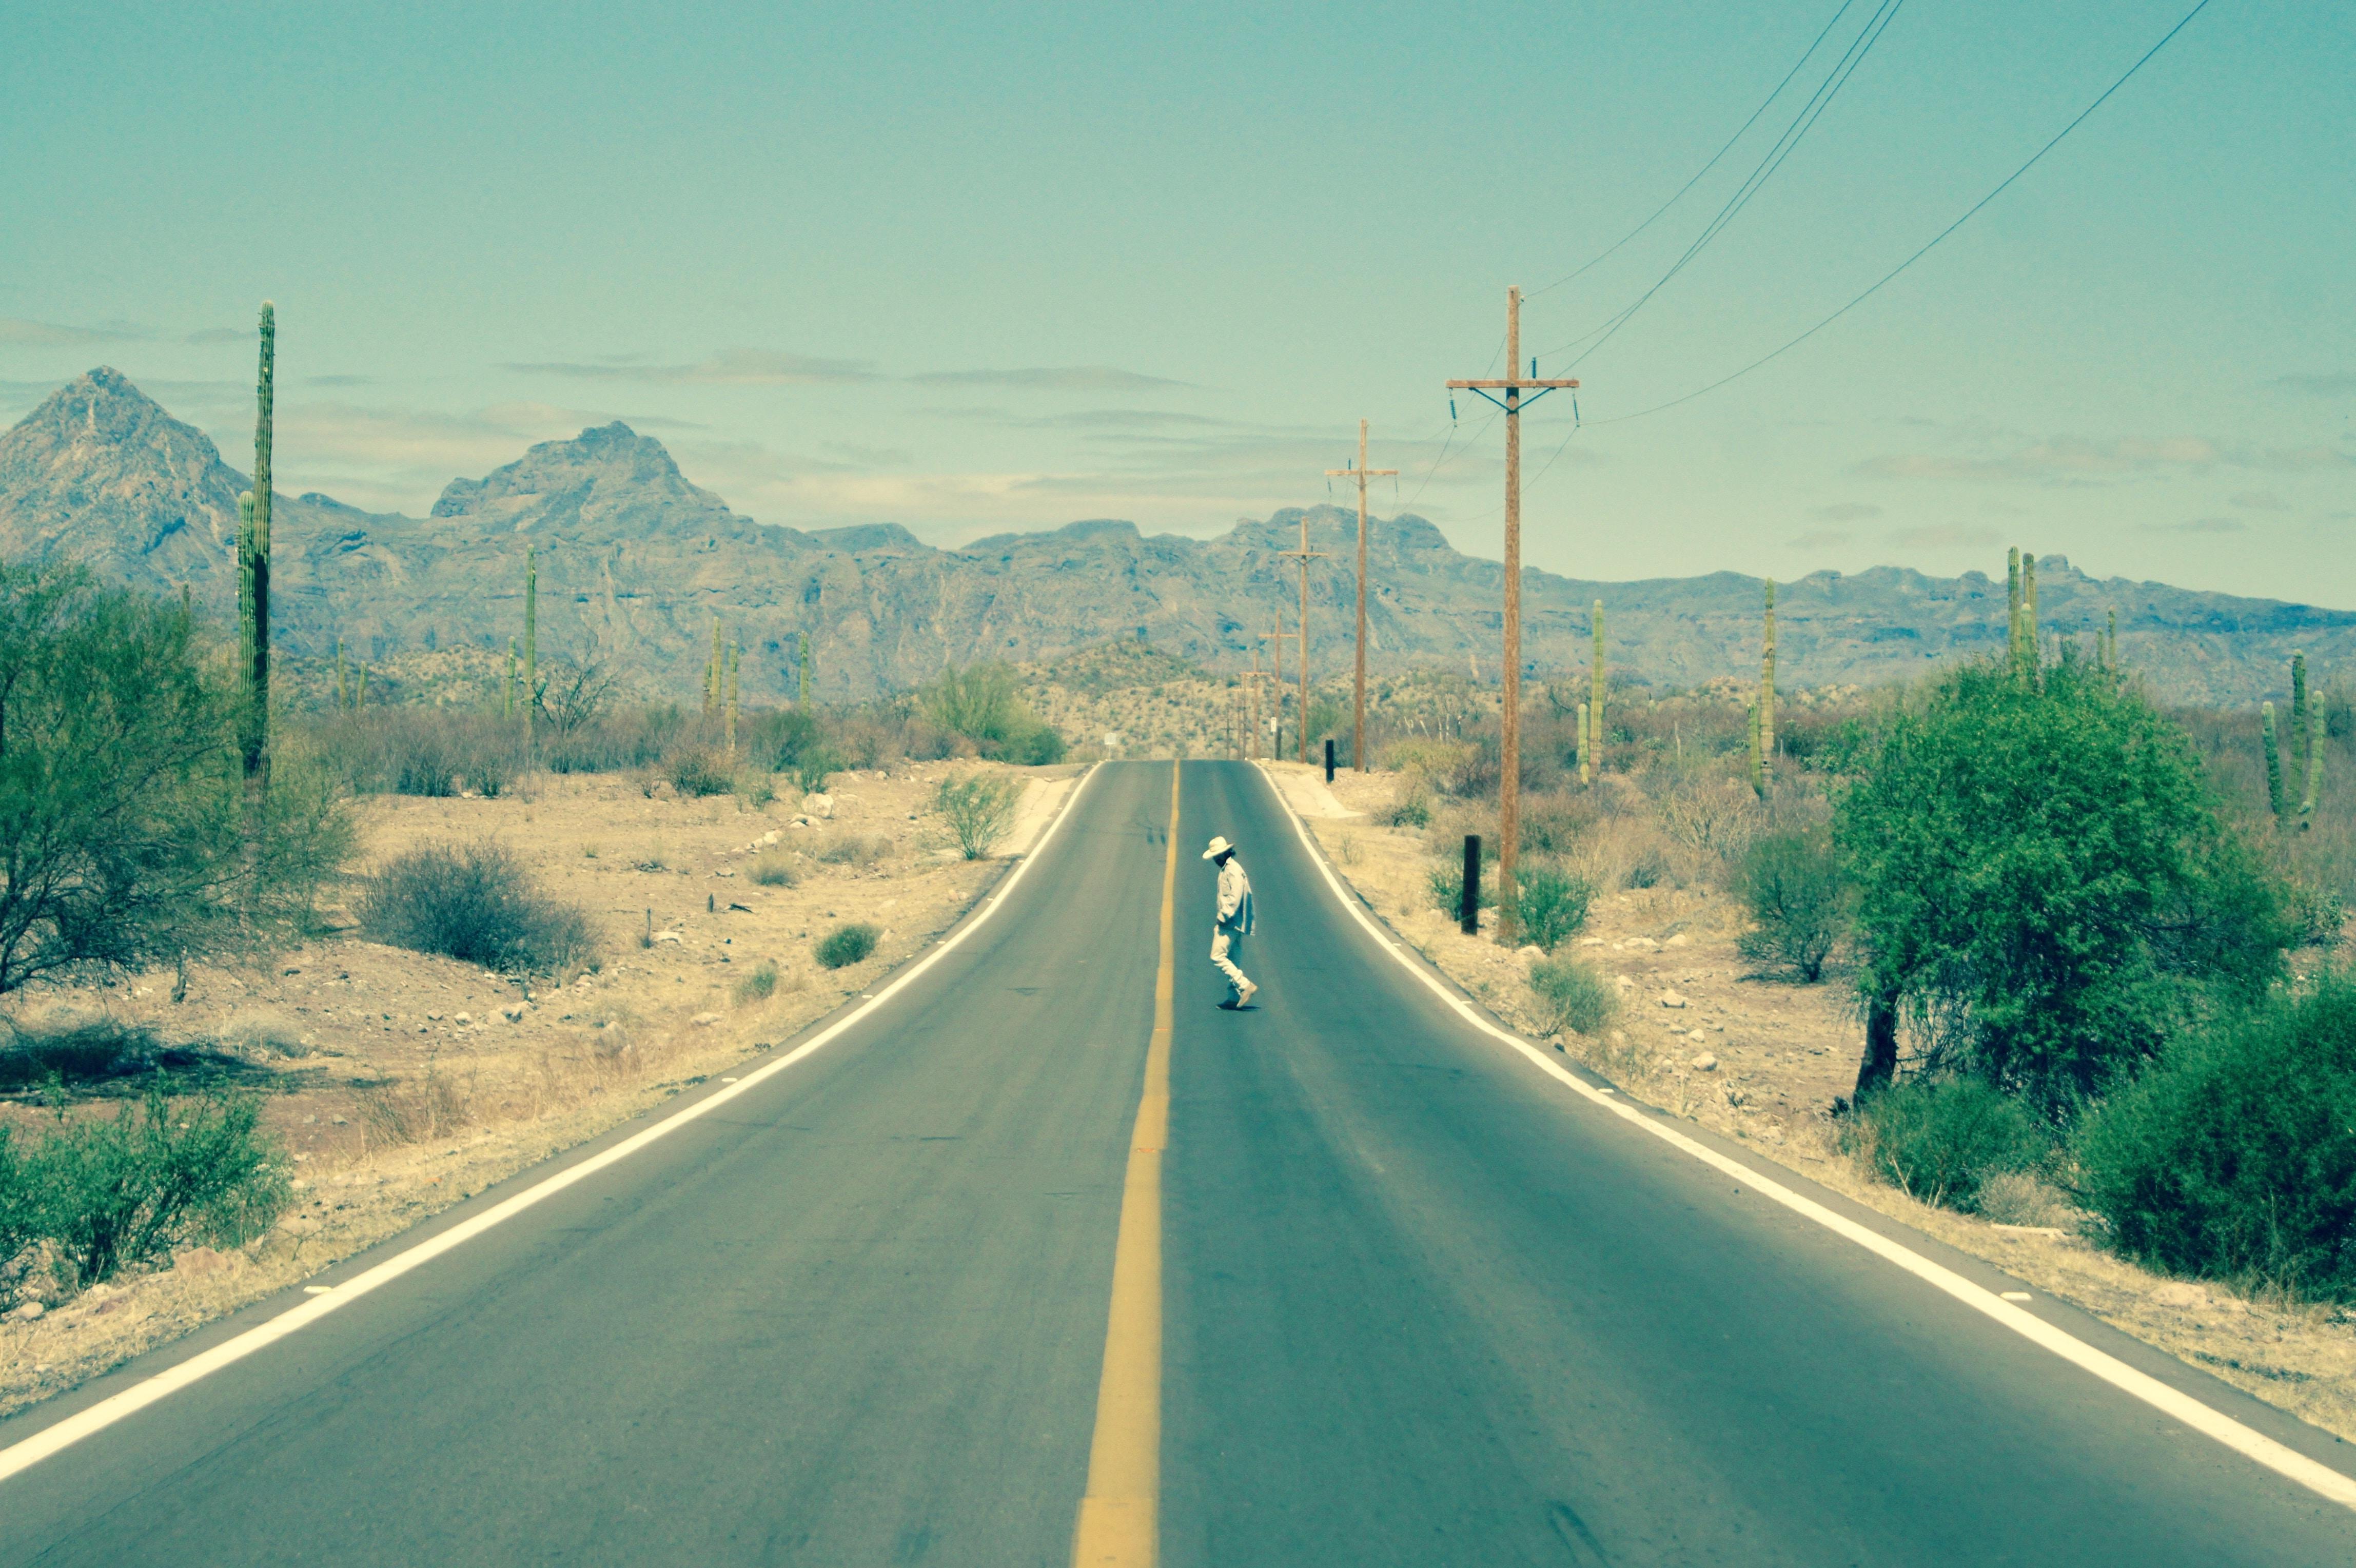 Hiker crosses the road in a desolate desert landscape